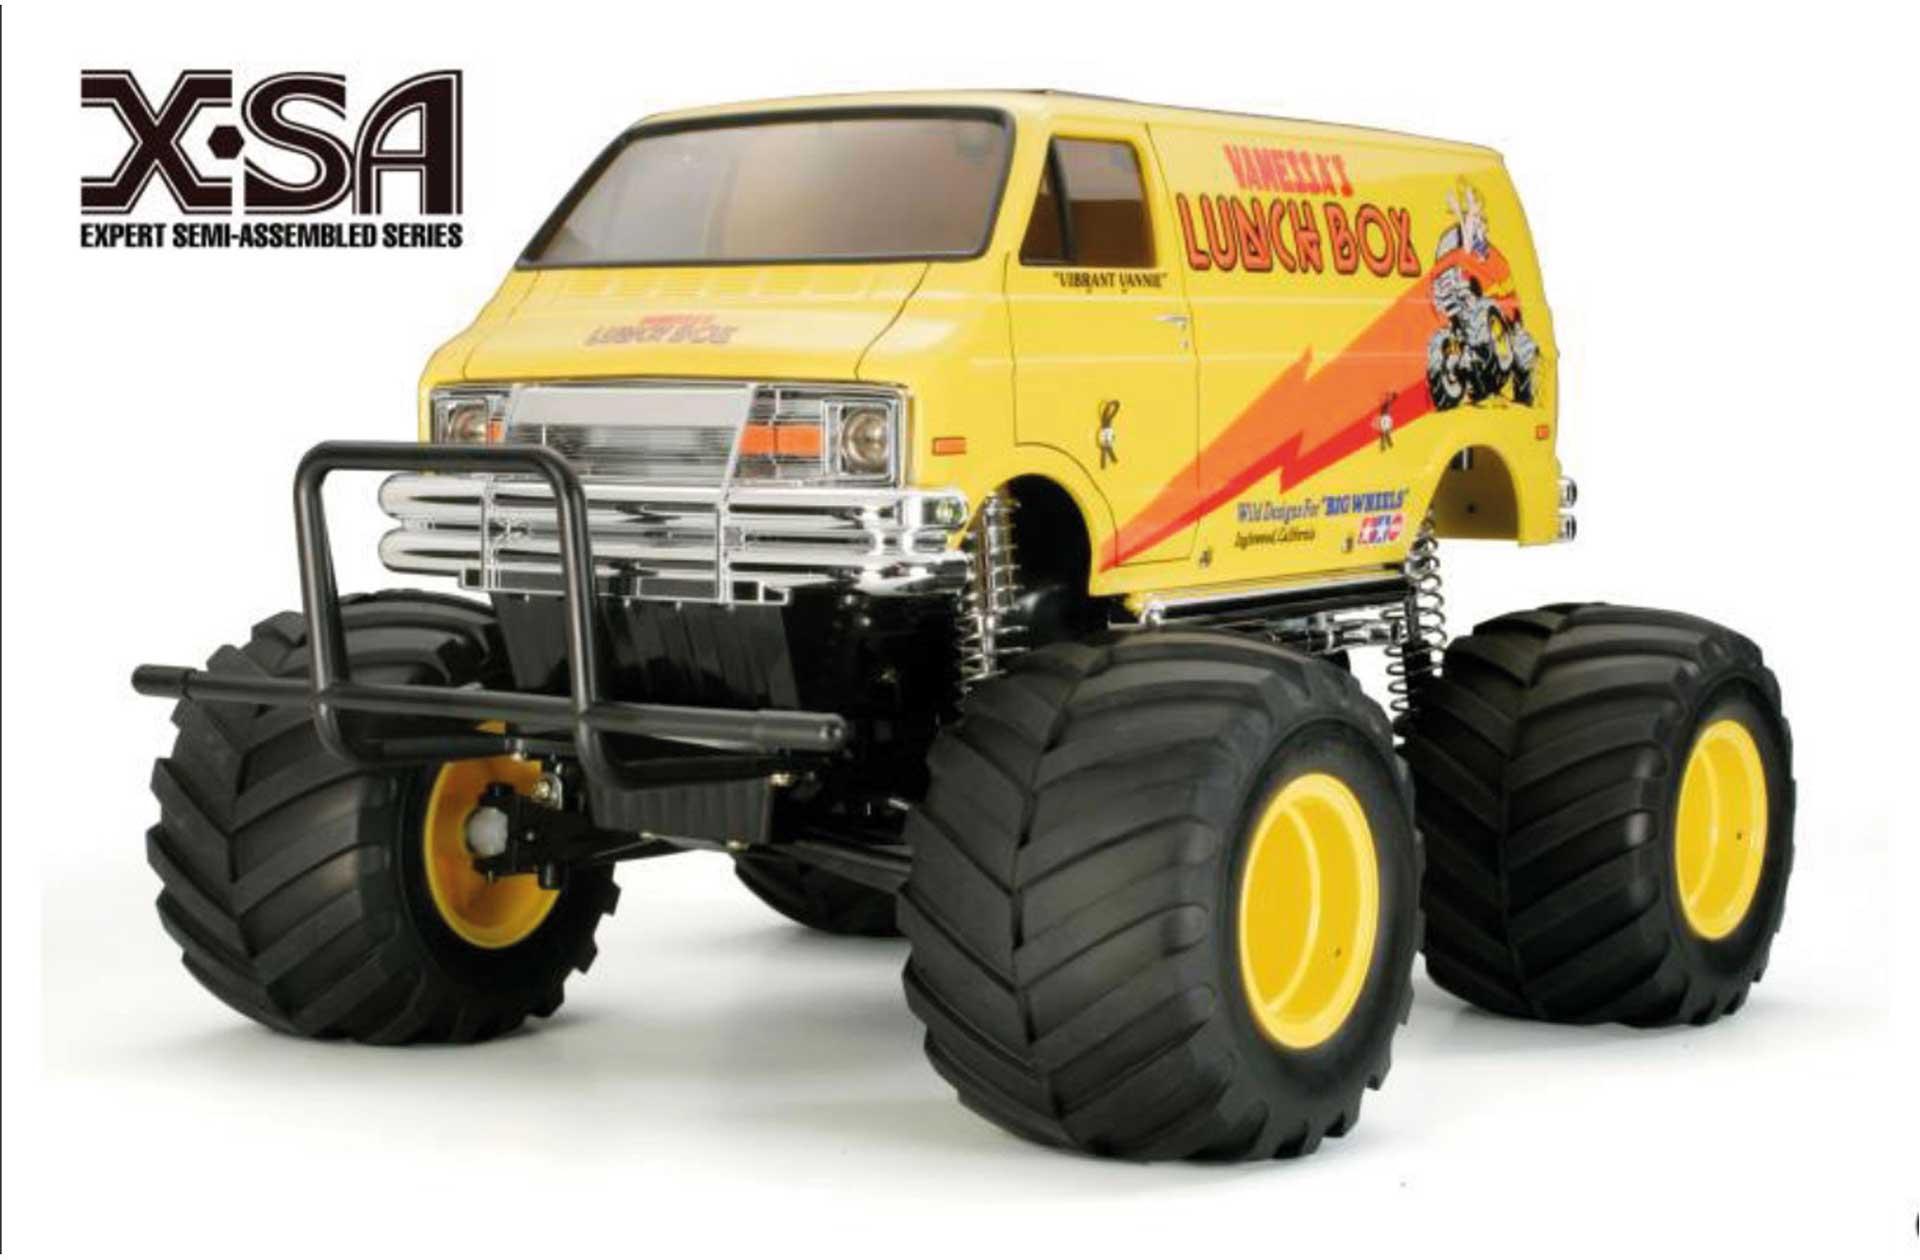 TAMIYA X-SA Lunch Box 1/12 EP 2WD aufgebautes Modell, Karosserie fertig